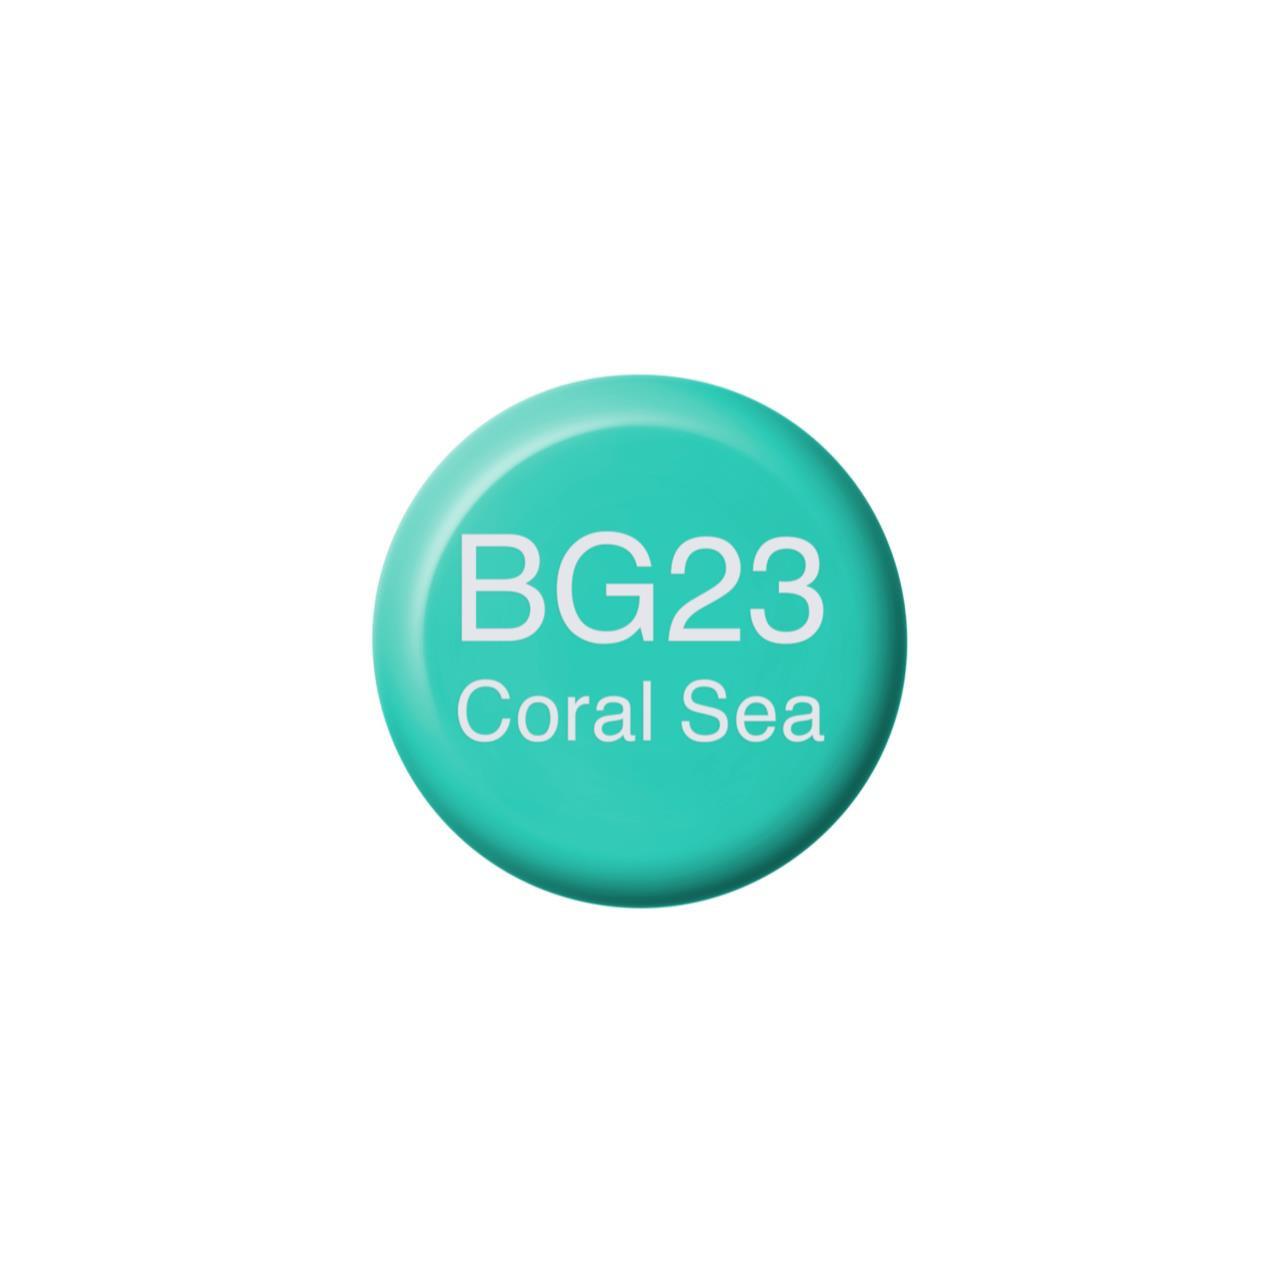 BG23 Coral Sea, Copic Ink - 4511338056271